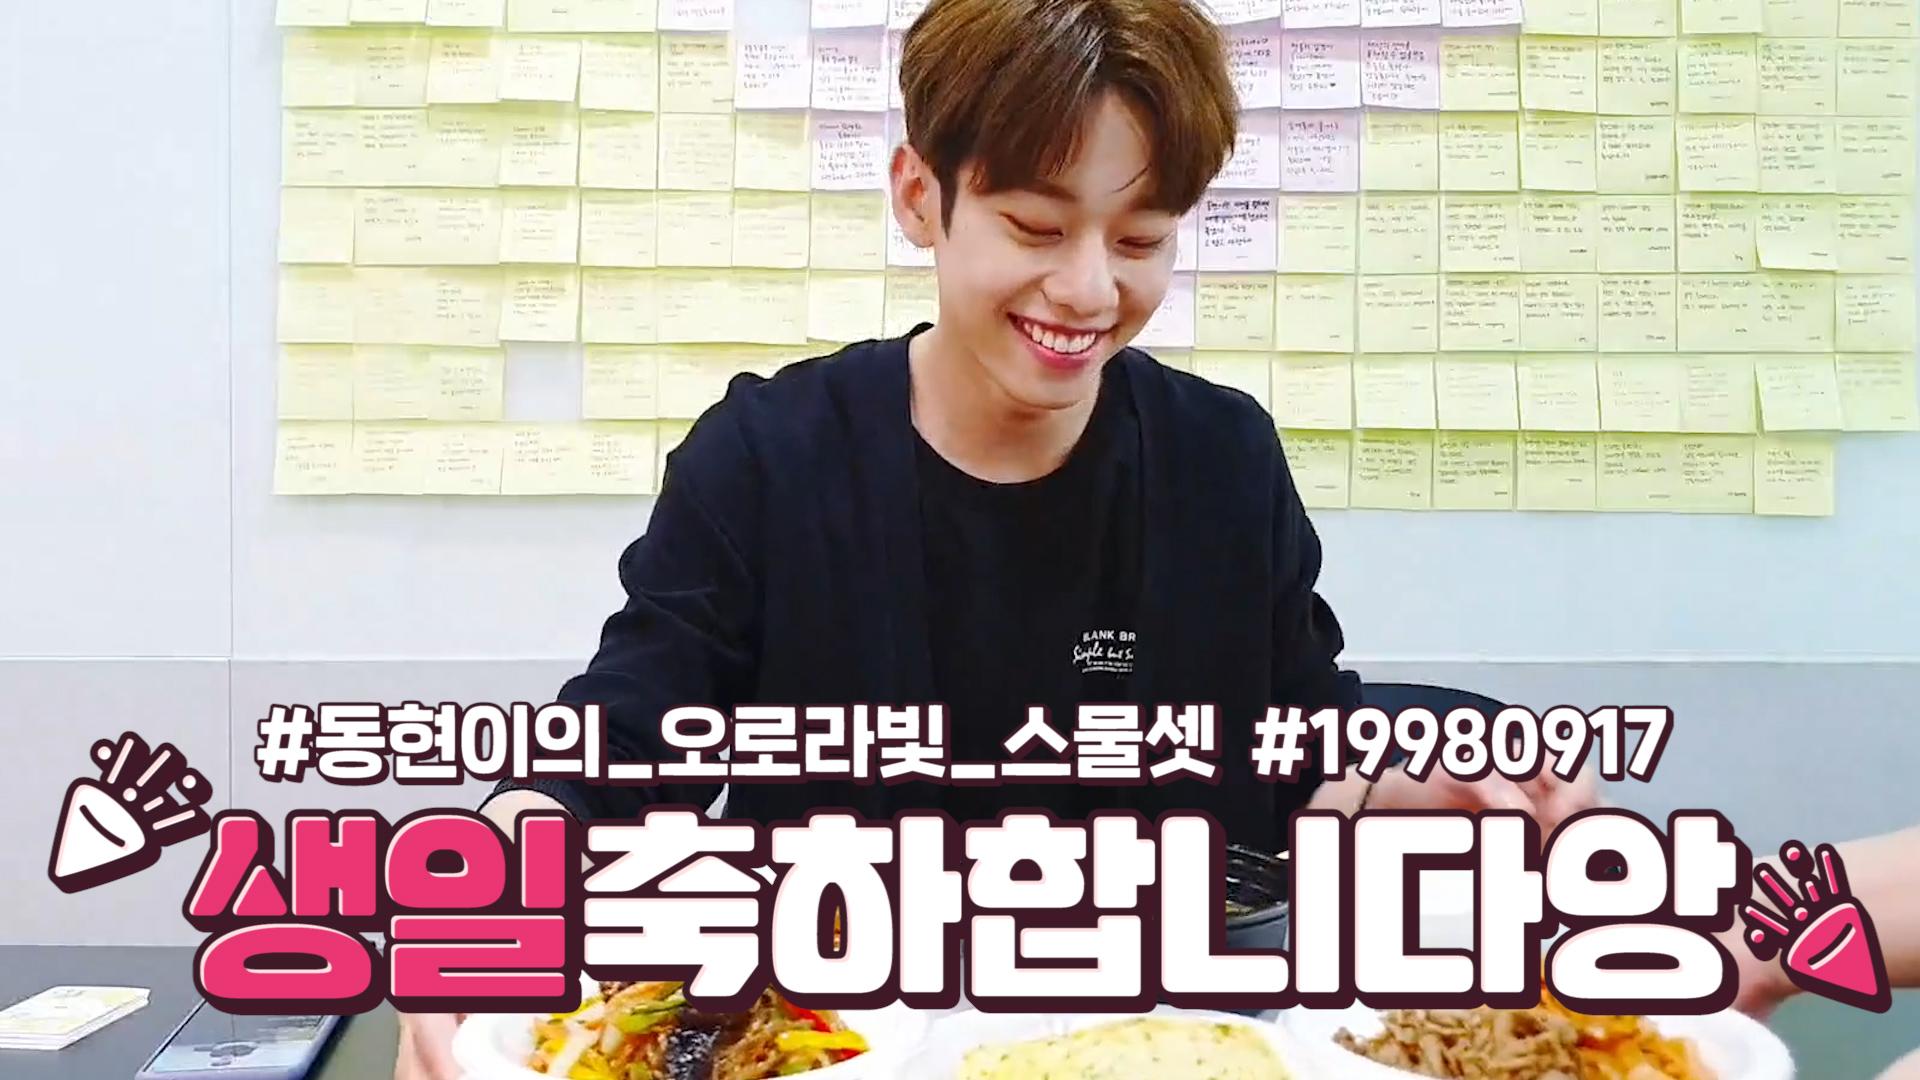 [AB6IX] 동현이는 숨쉬듯이 귀엽기 미션도 클리어잖아🎂🐿 (HAPPY DONGHYUN DAY!)